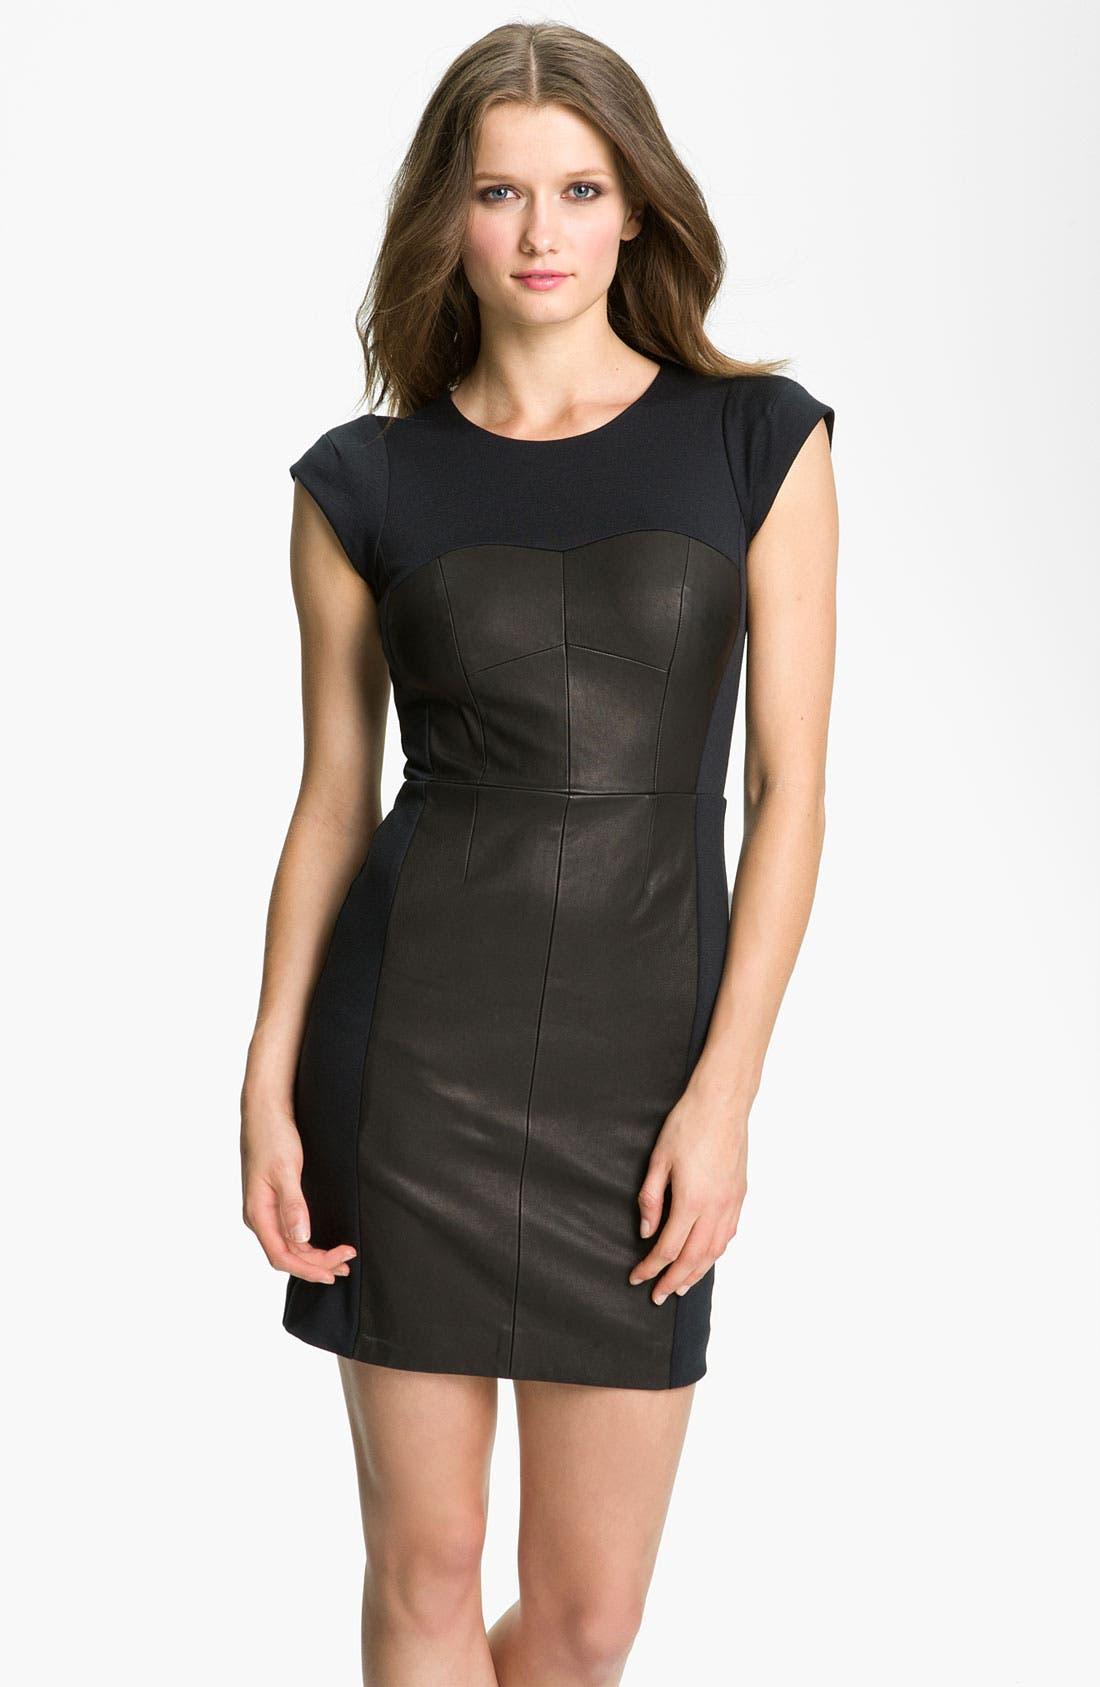 Alternate Image 1 Selected - Rebecca Taylor Colorblock Leather Sheath Dress